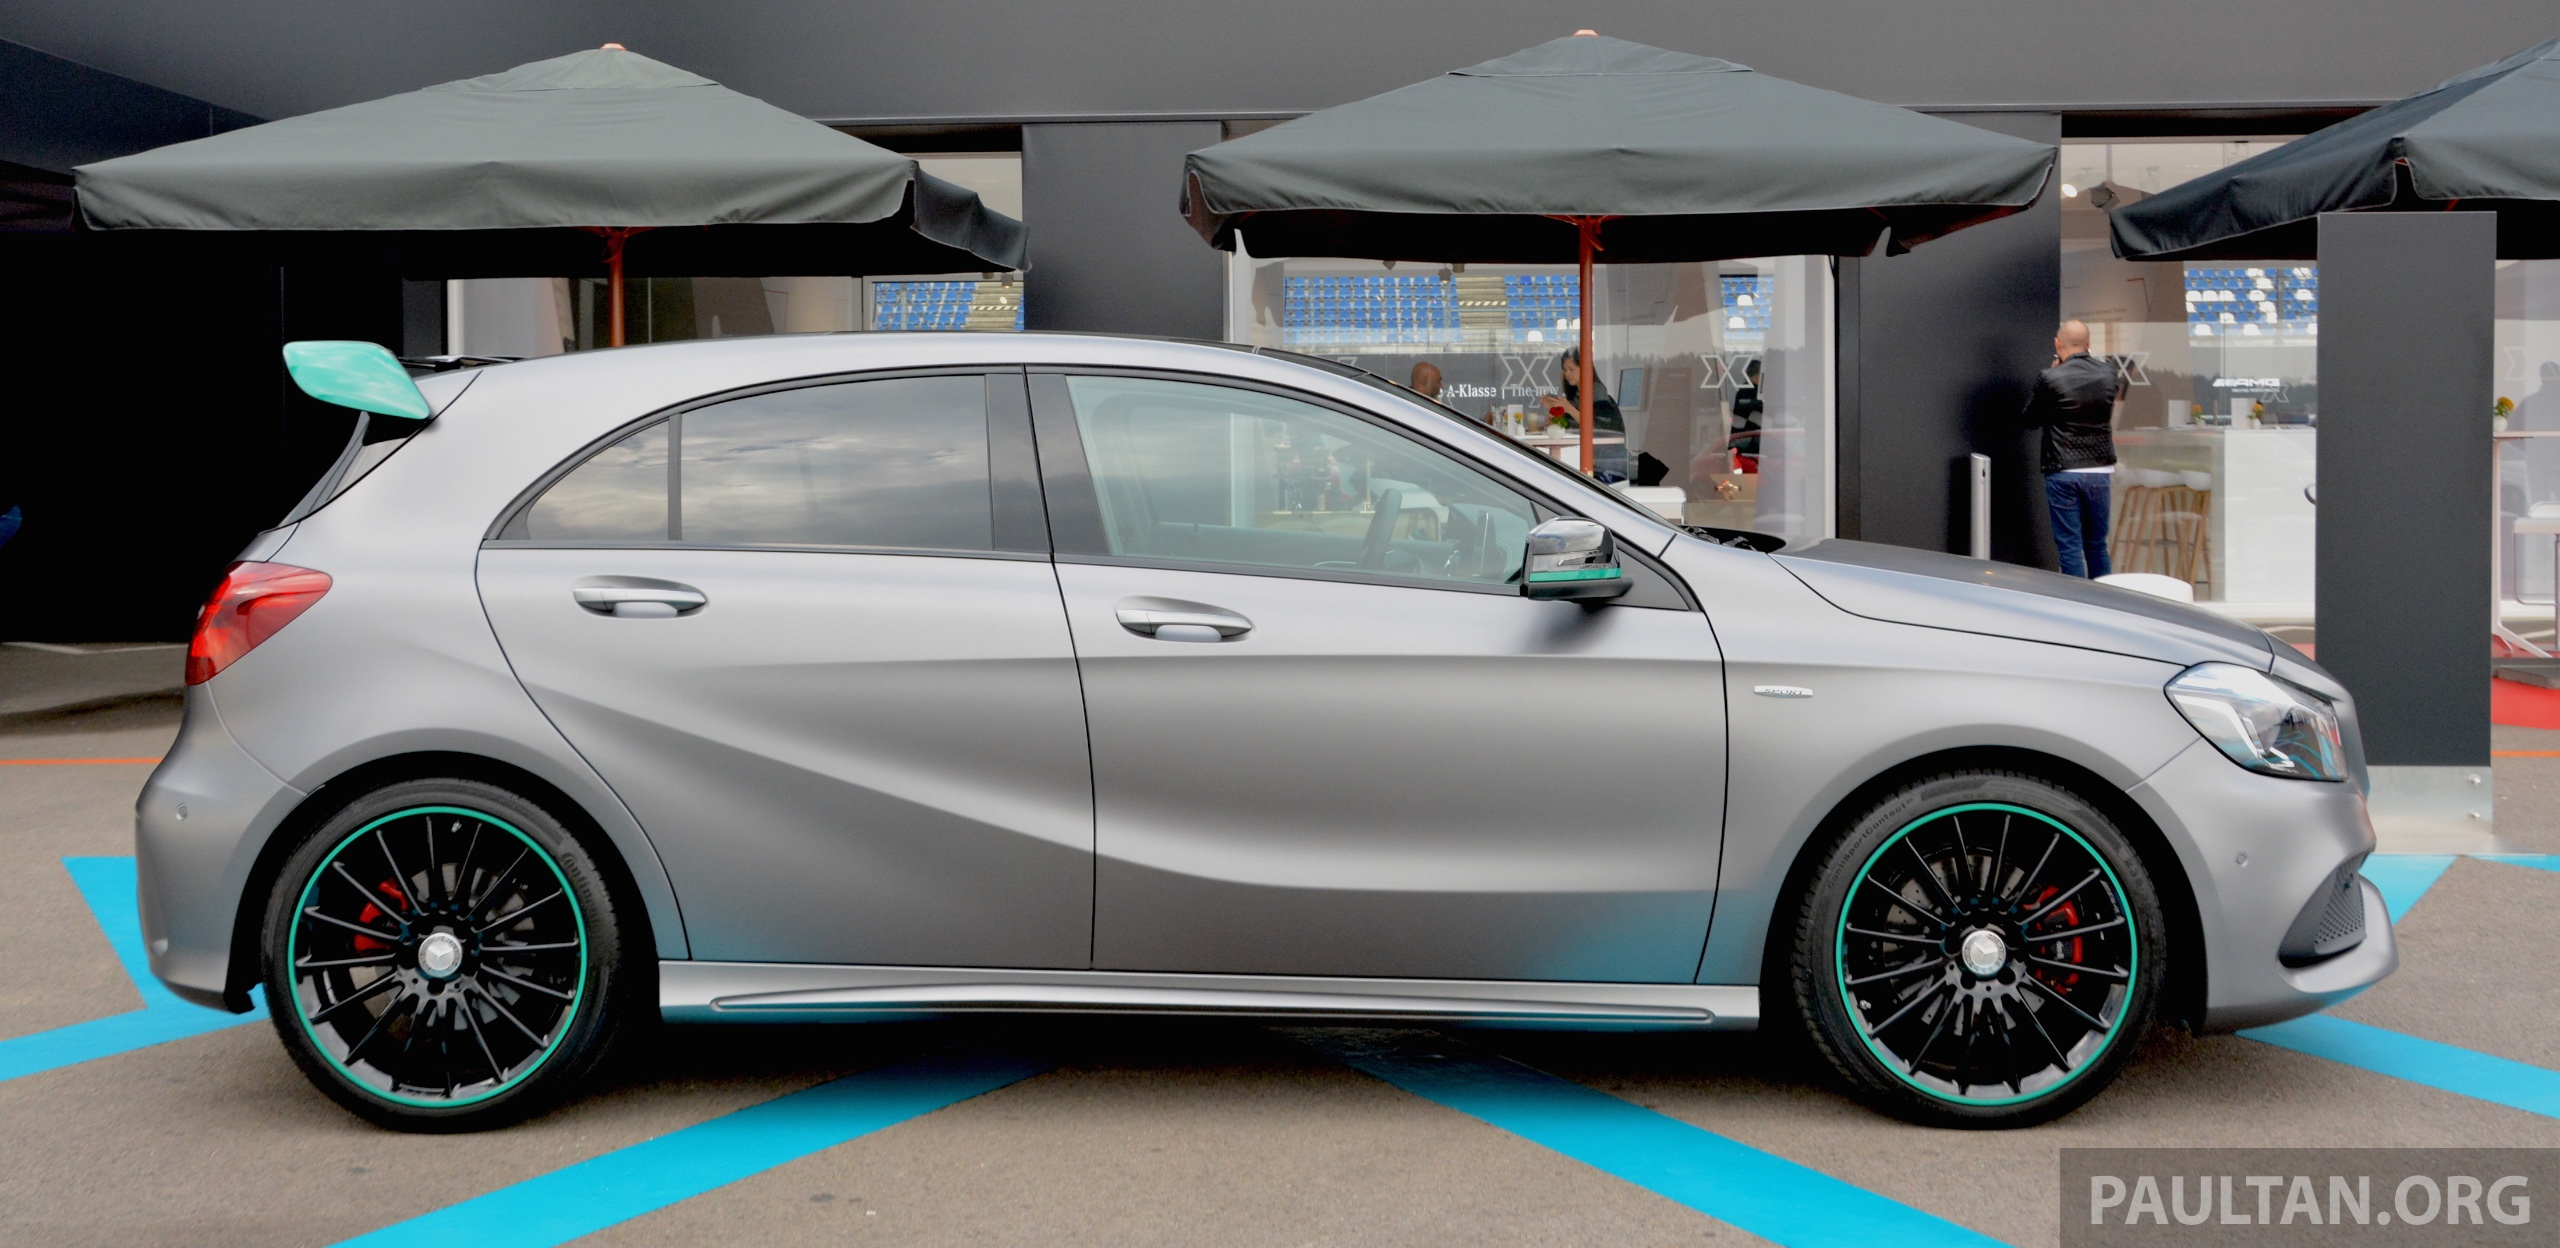 Gallery mercedes benz a class motorsport edition image 378893 for Mercedes benz petronas